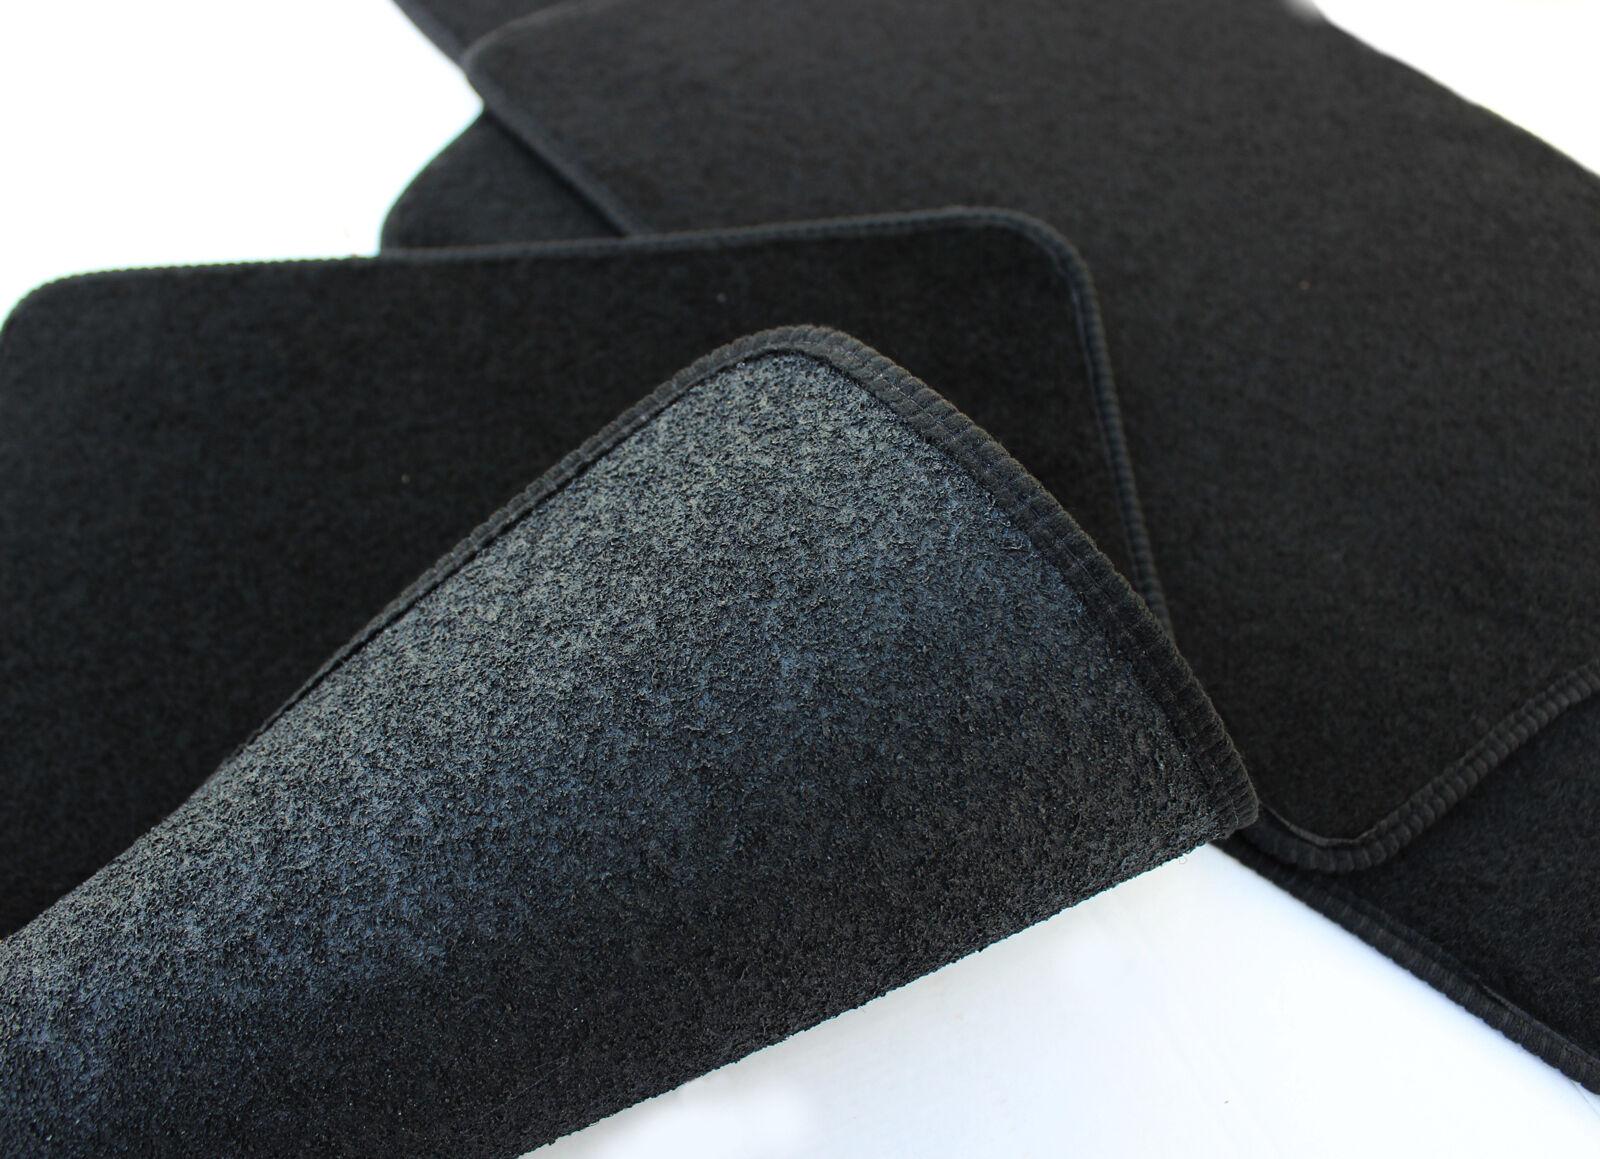 fu matten automatten velours f r peugeot 307 cc 2001 08 4tlg schwarz ebay. Black Bedroom Furniture Sets. Home Design Ideas